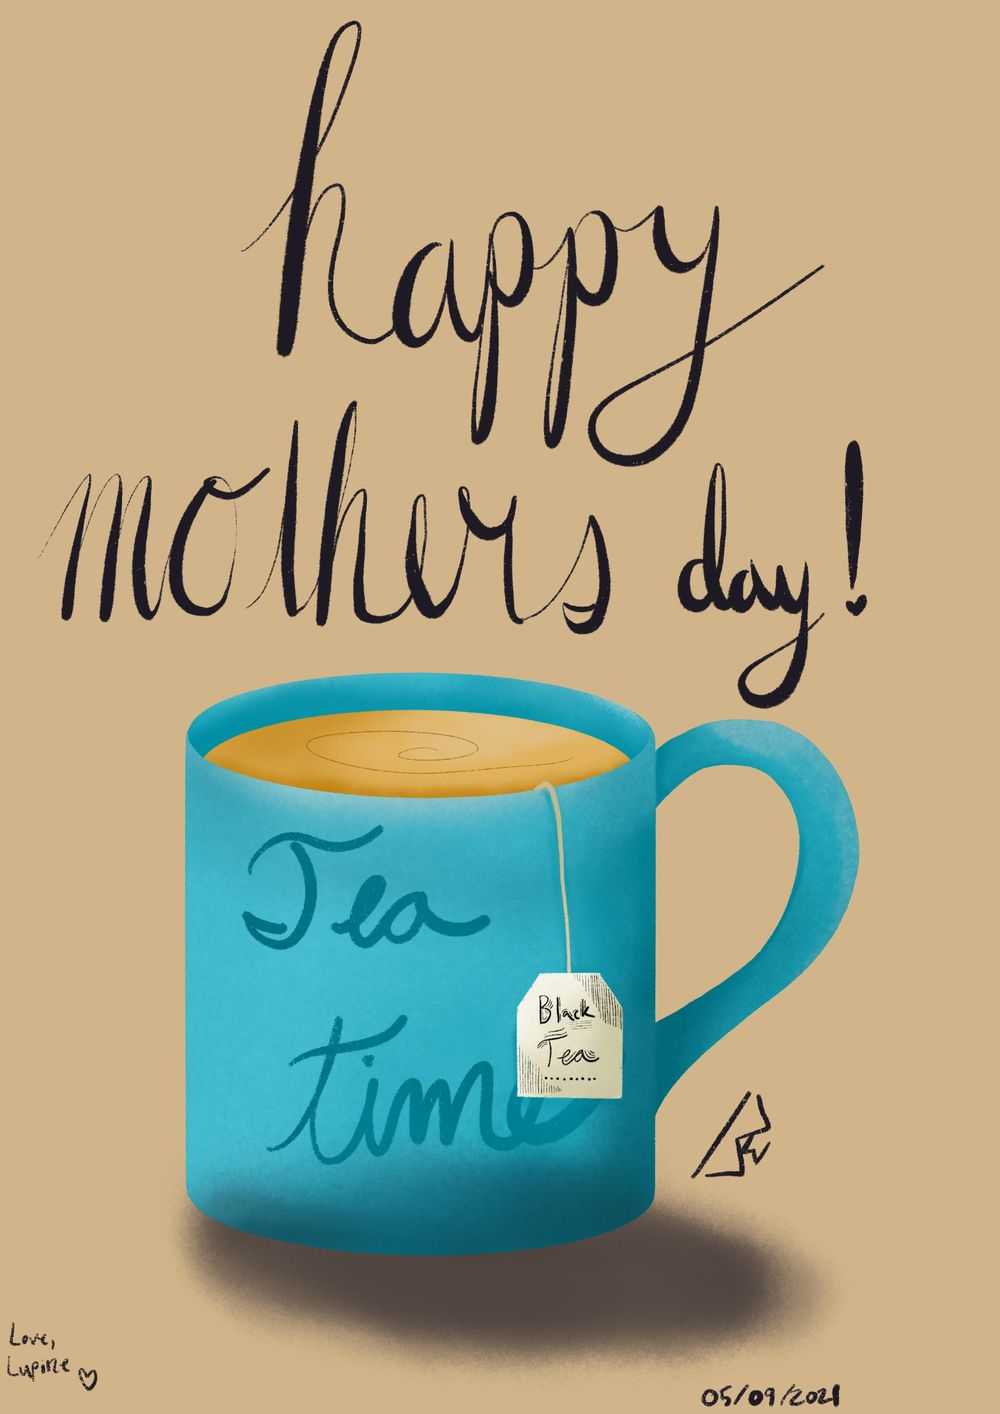 Motivational mug - image 2 - student project